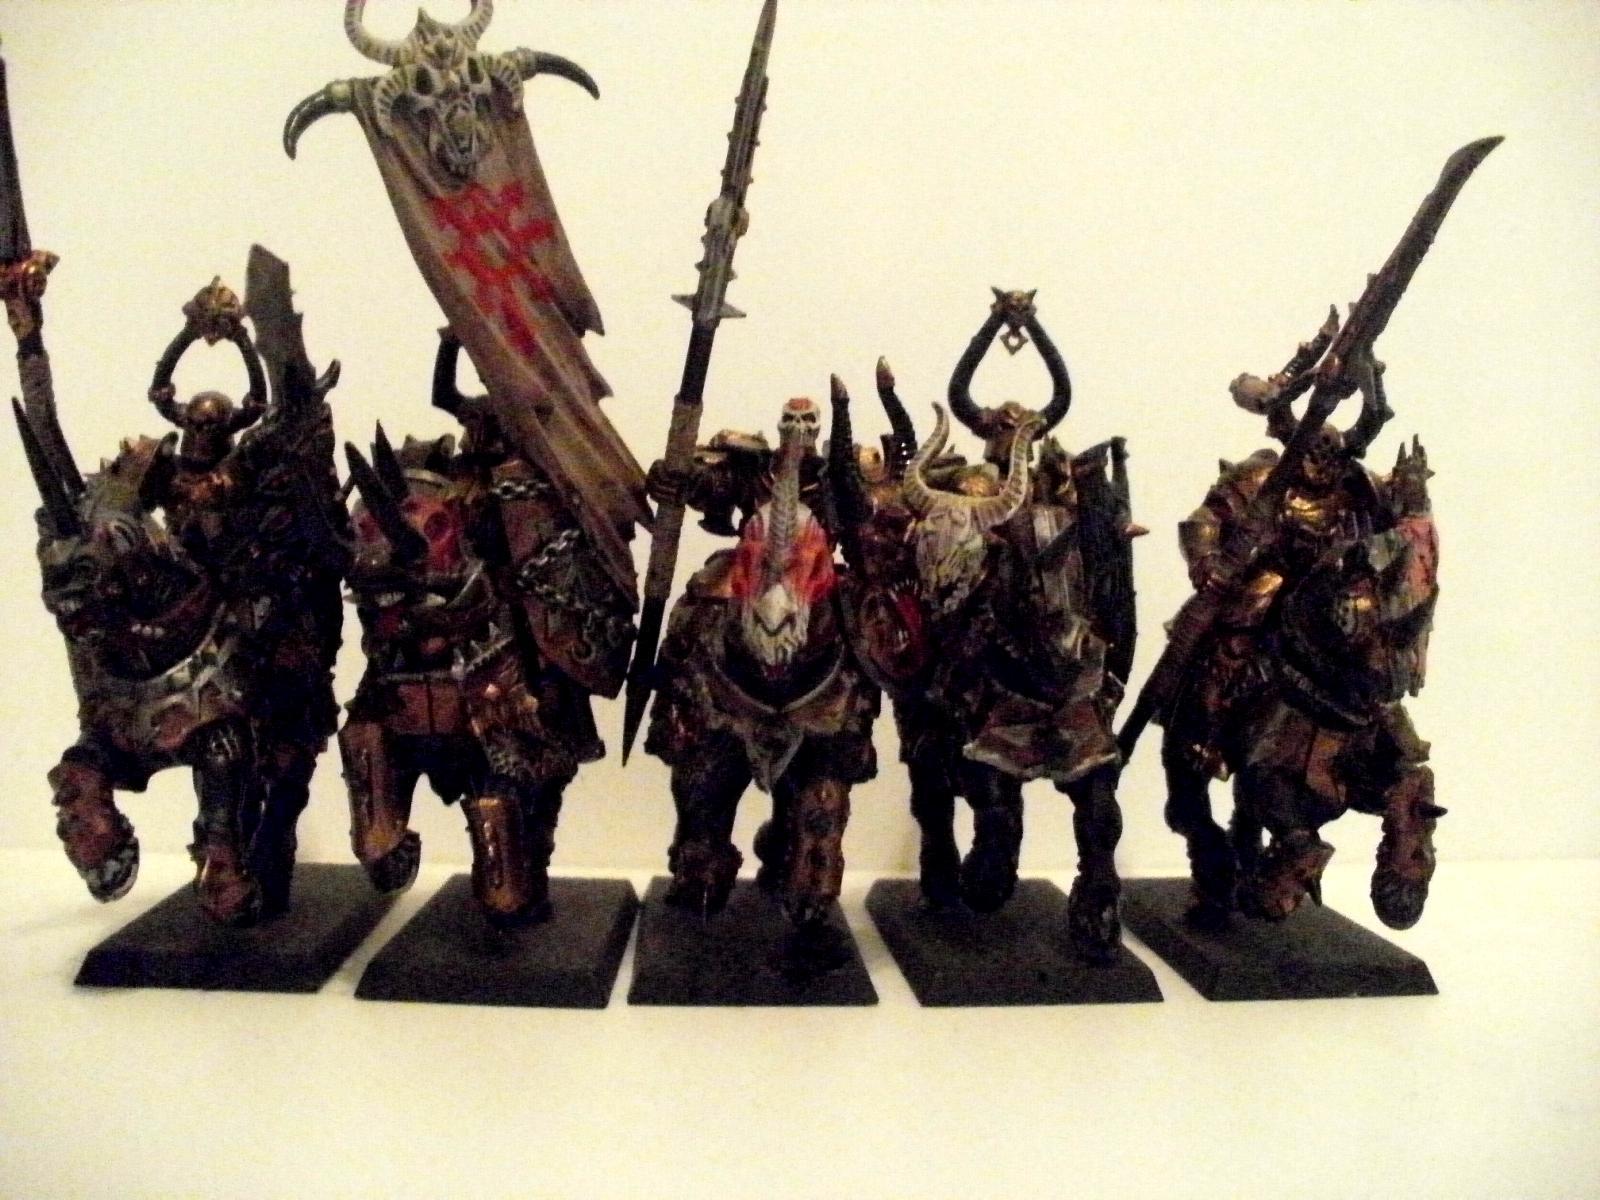 Chaos Knights: Lances